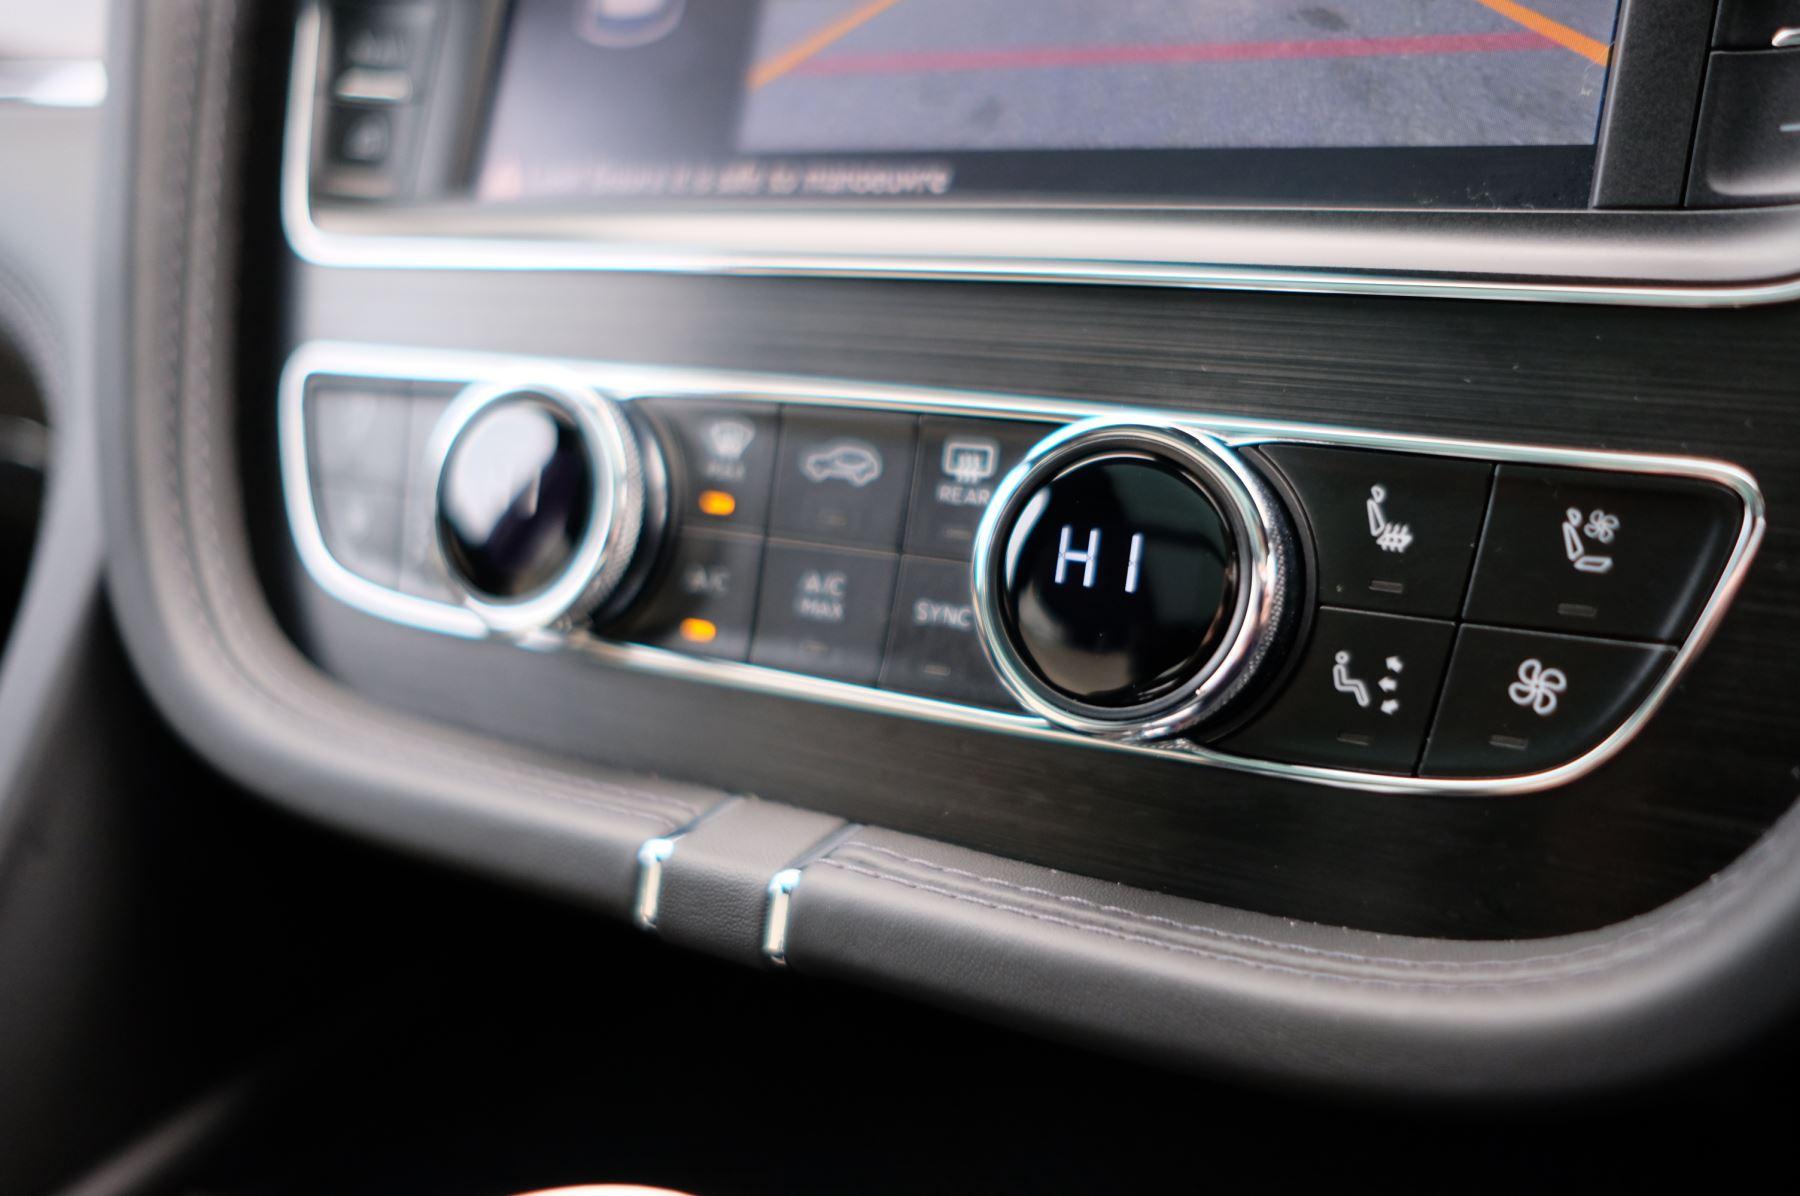 Bentley Bentayga Diesel 4.0 V8 Mulliner Driving Spec 5dr Auto - 7 Seat Specification image 24